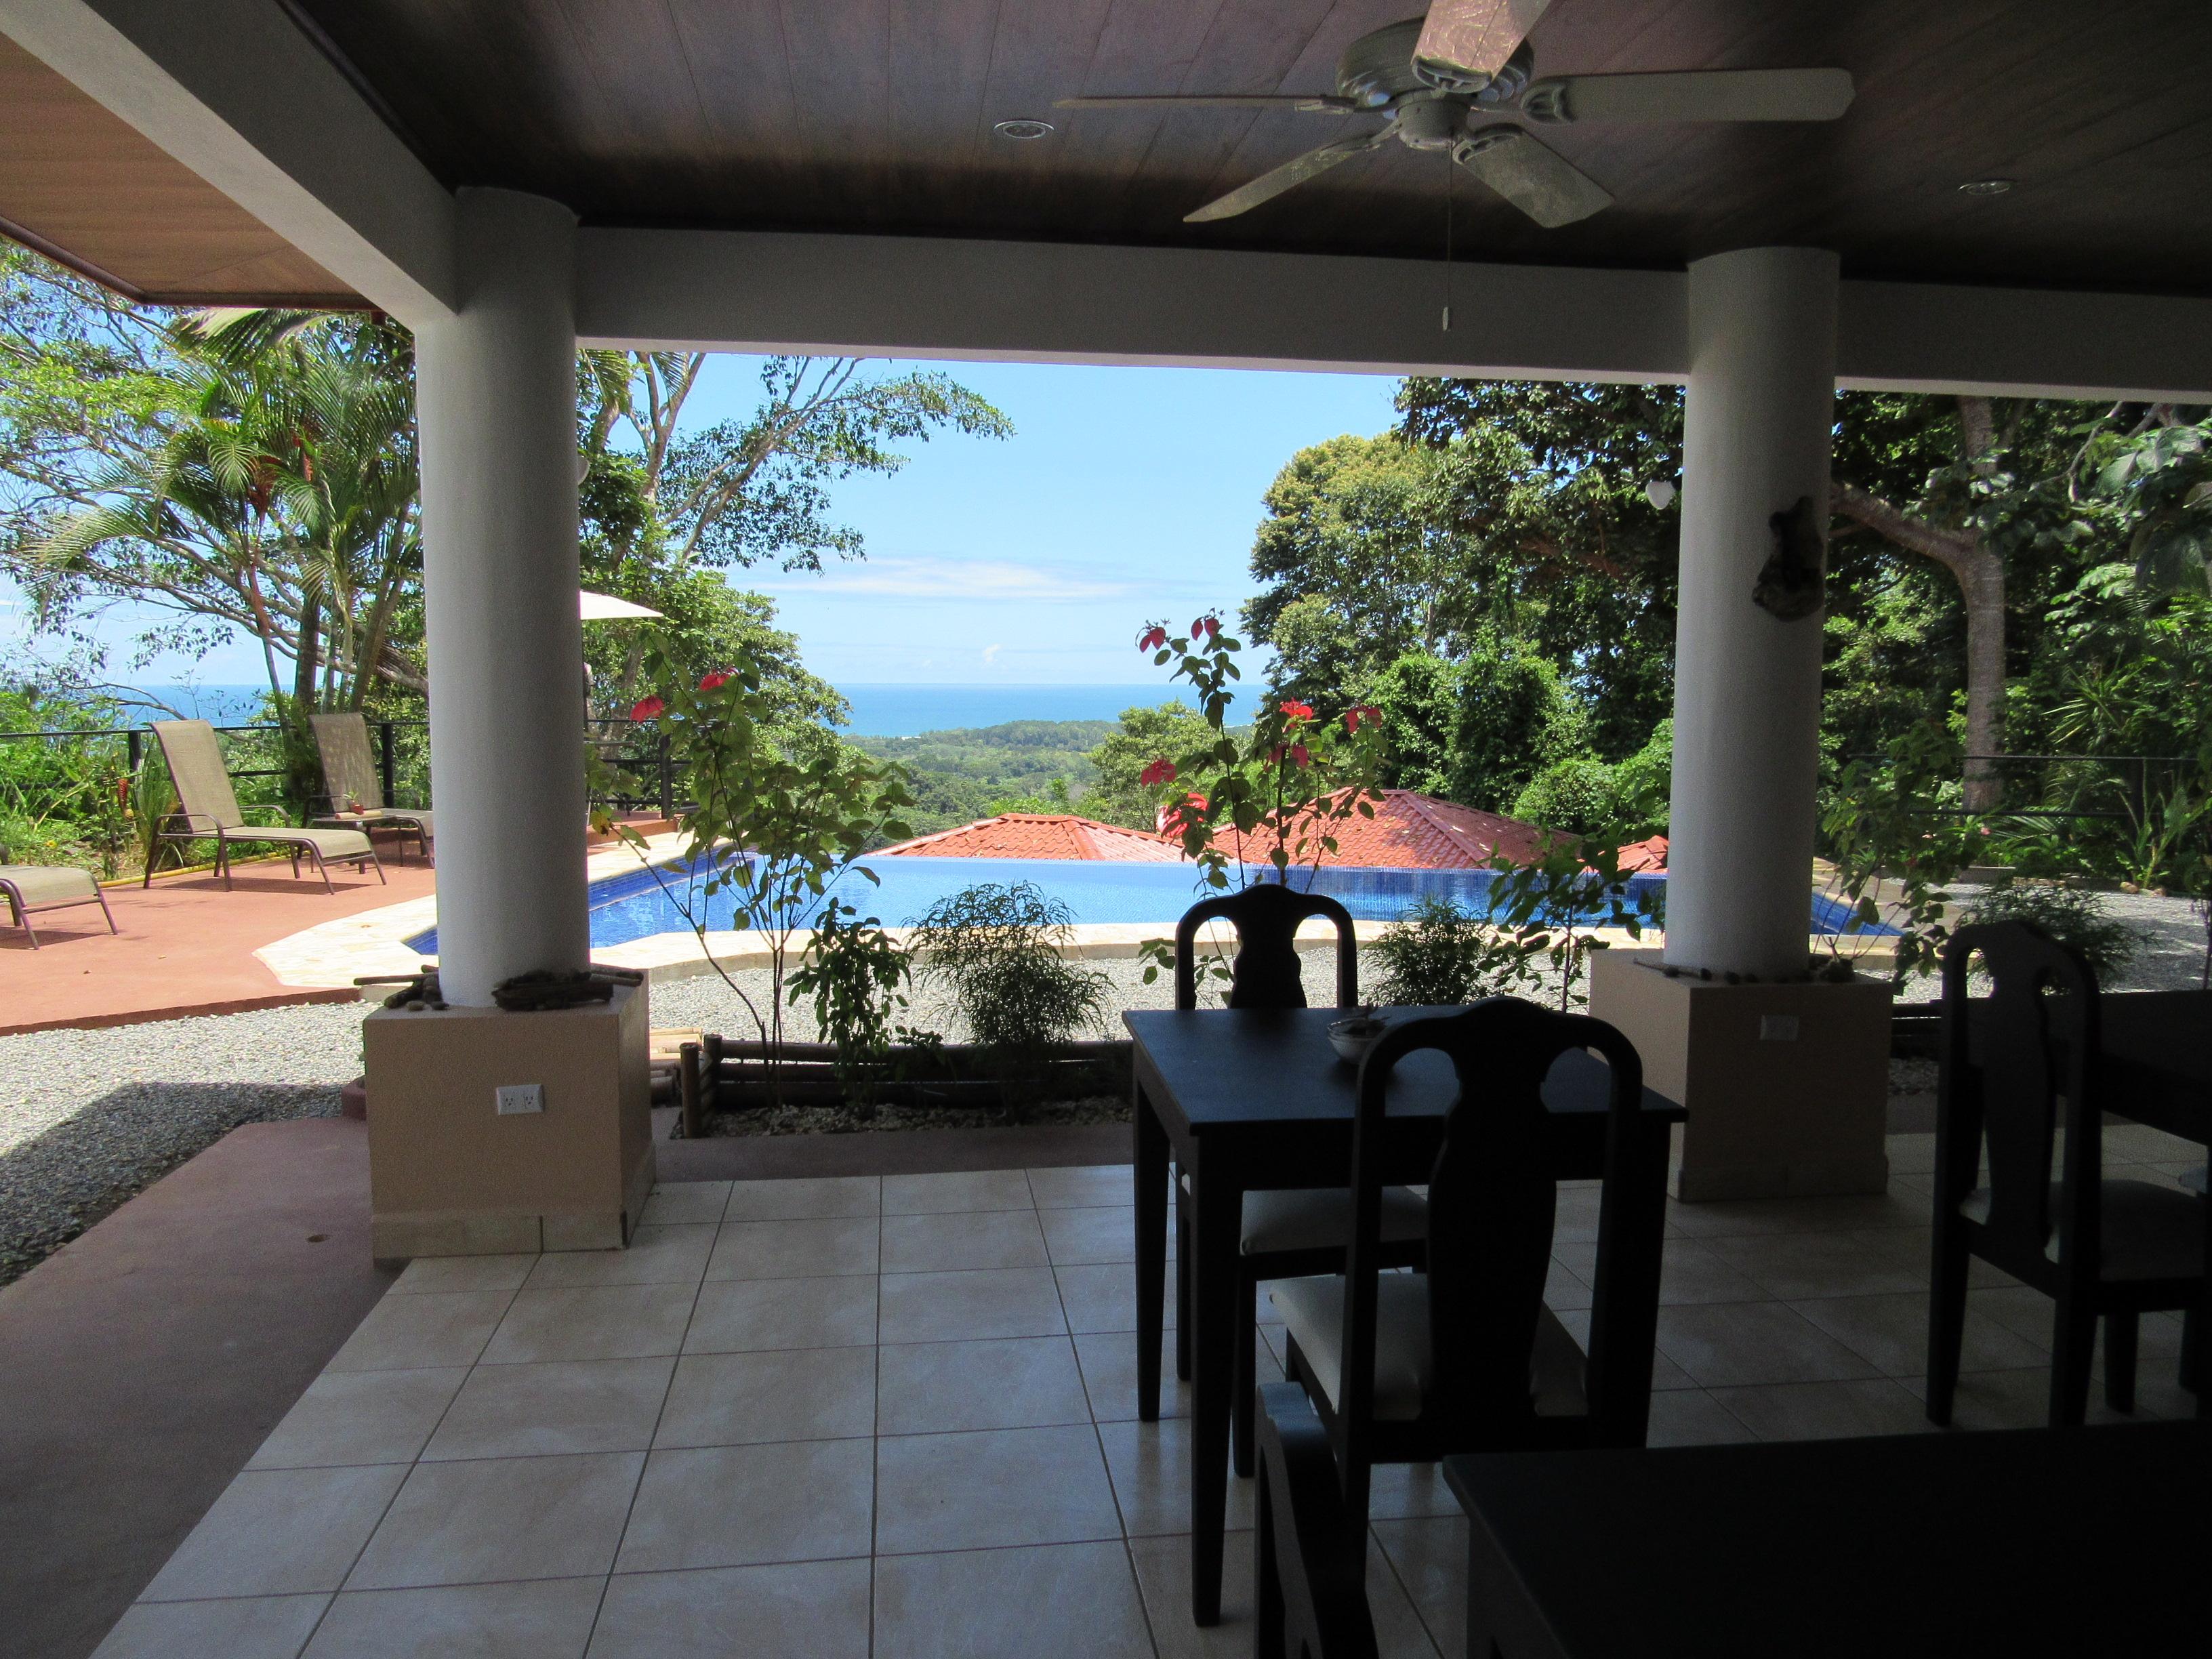 Hatillo-Costa-Rica-property-costaricarealestateHAT087-5.jpg